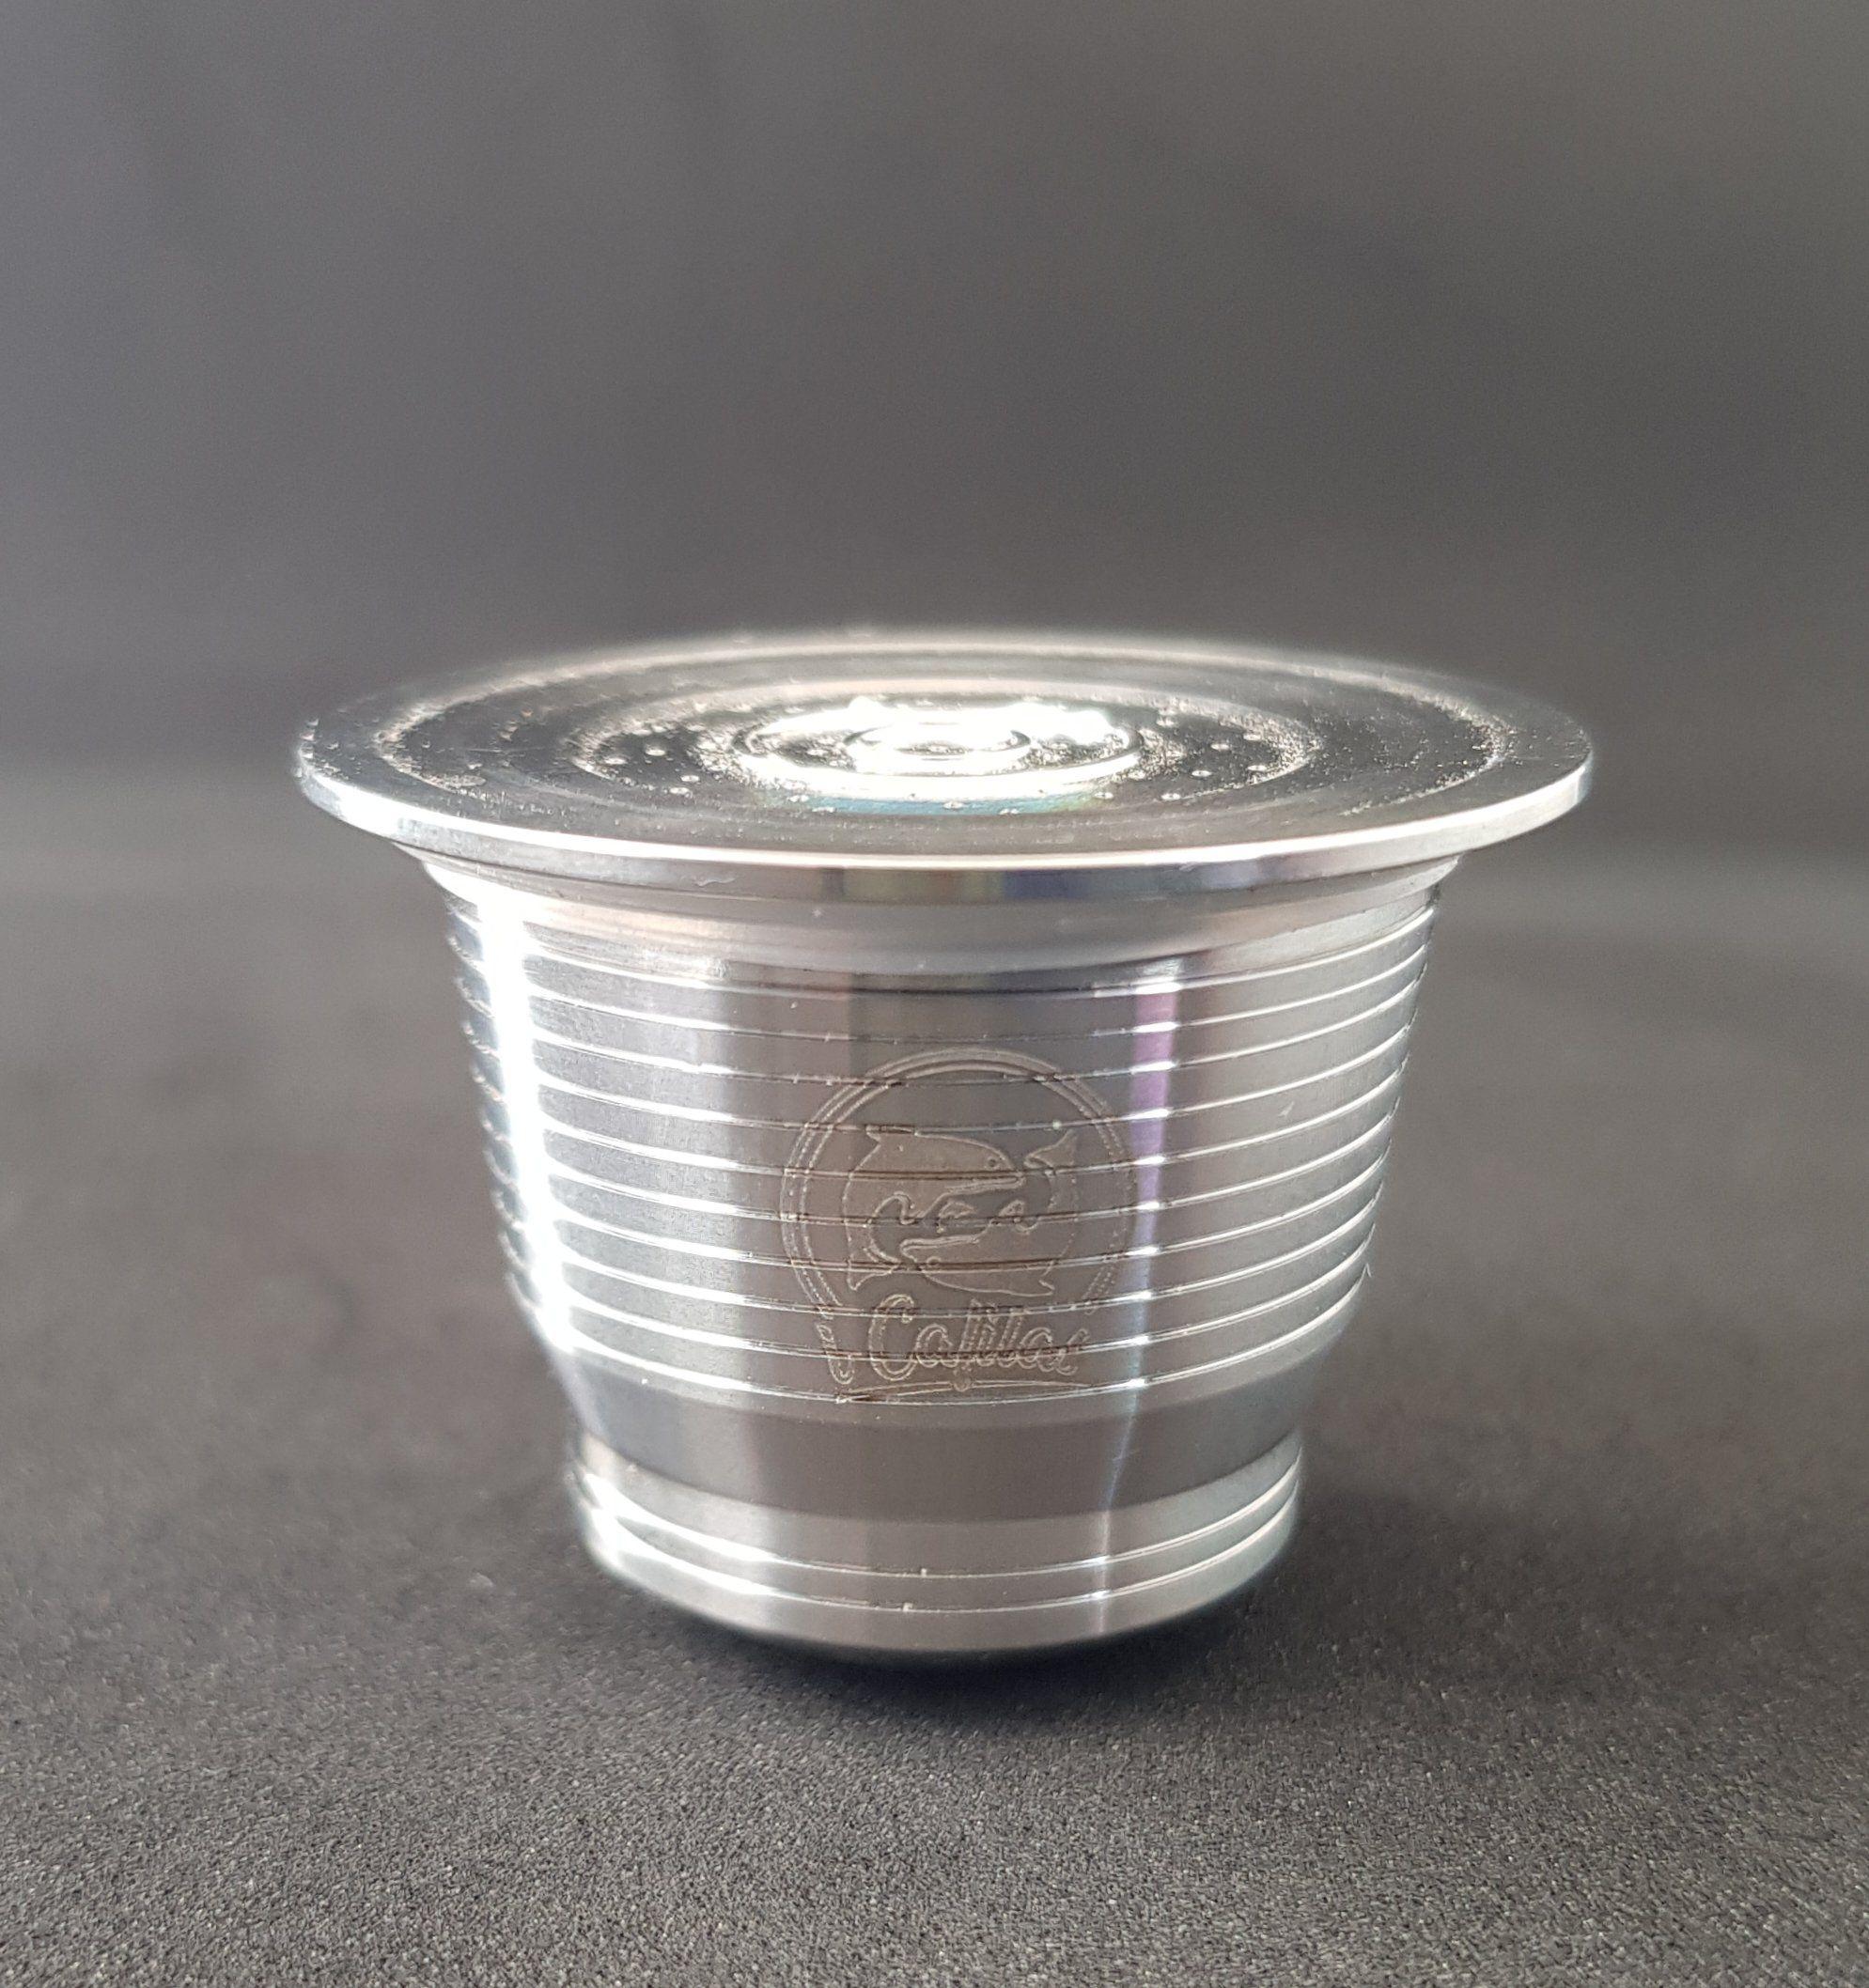 Stainless Steel Nespresso Capsules ecocoffeestore